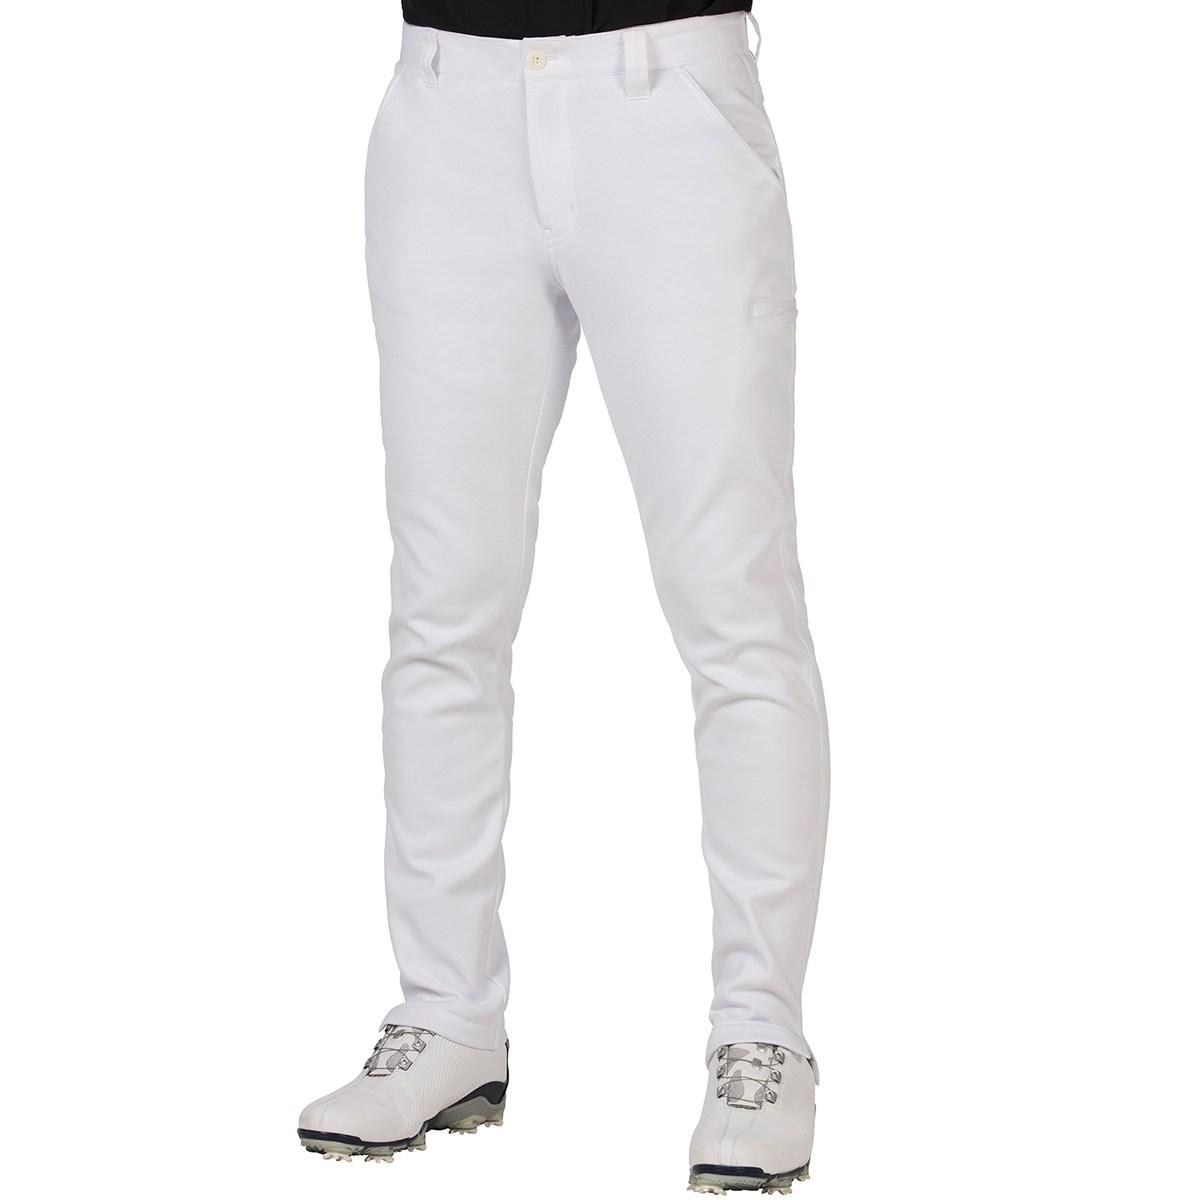 GDO オリジナル GDO ORIGINAL 7ポケットボンディングパンツ 股下79cm 5:ウエスト目安87-89 ホワイト